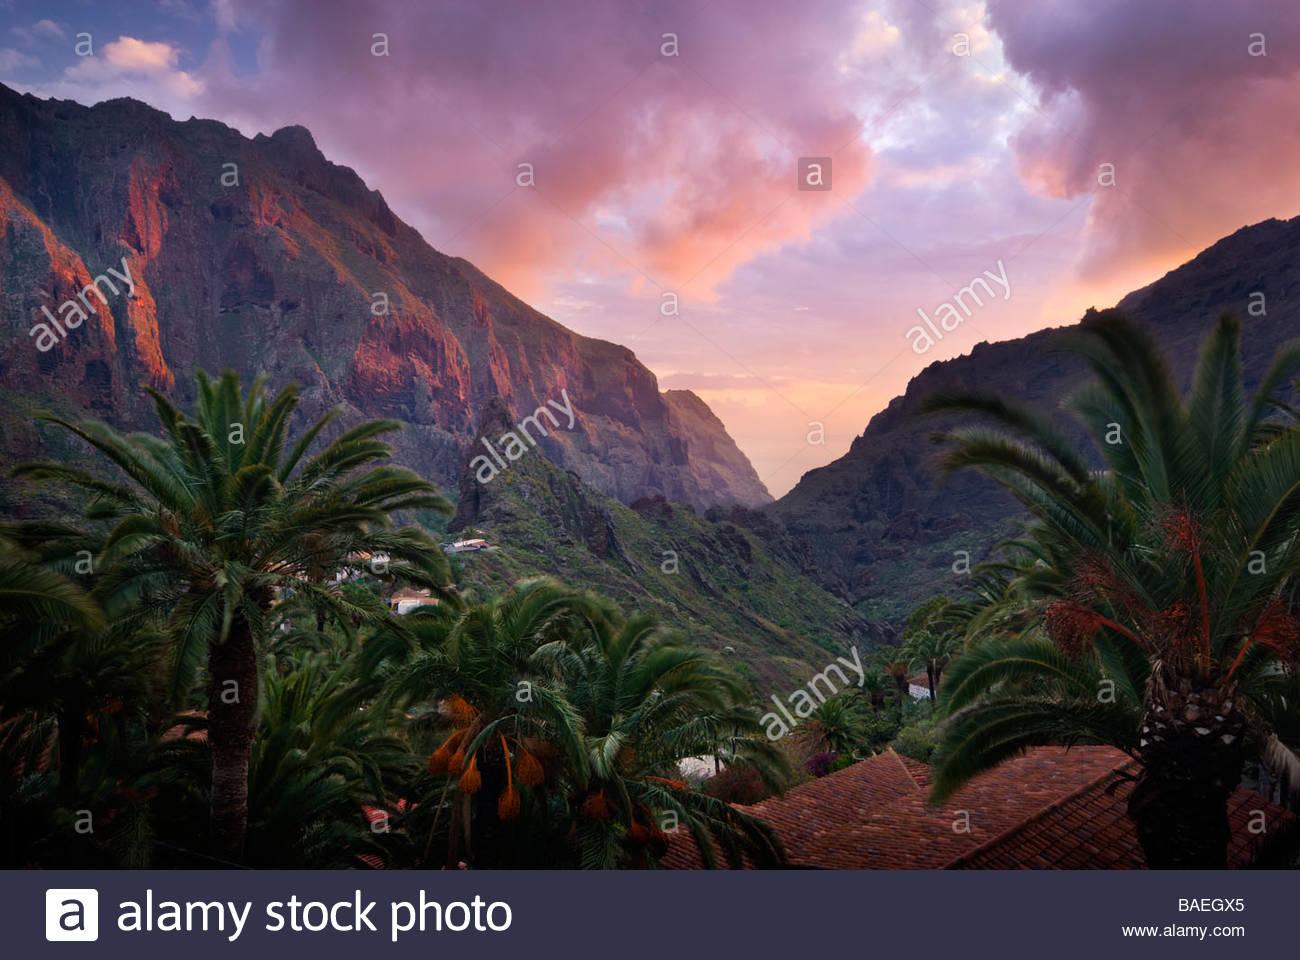 Das Dorf Masca, Teneriffa, Kanarische Inseln, Spanien. Stockbild